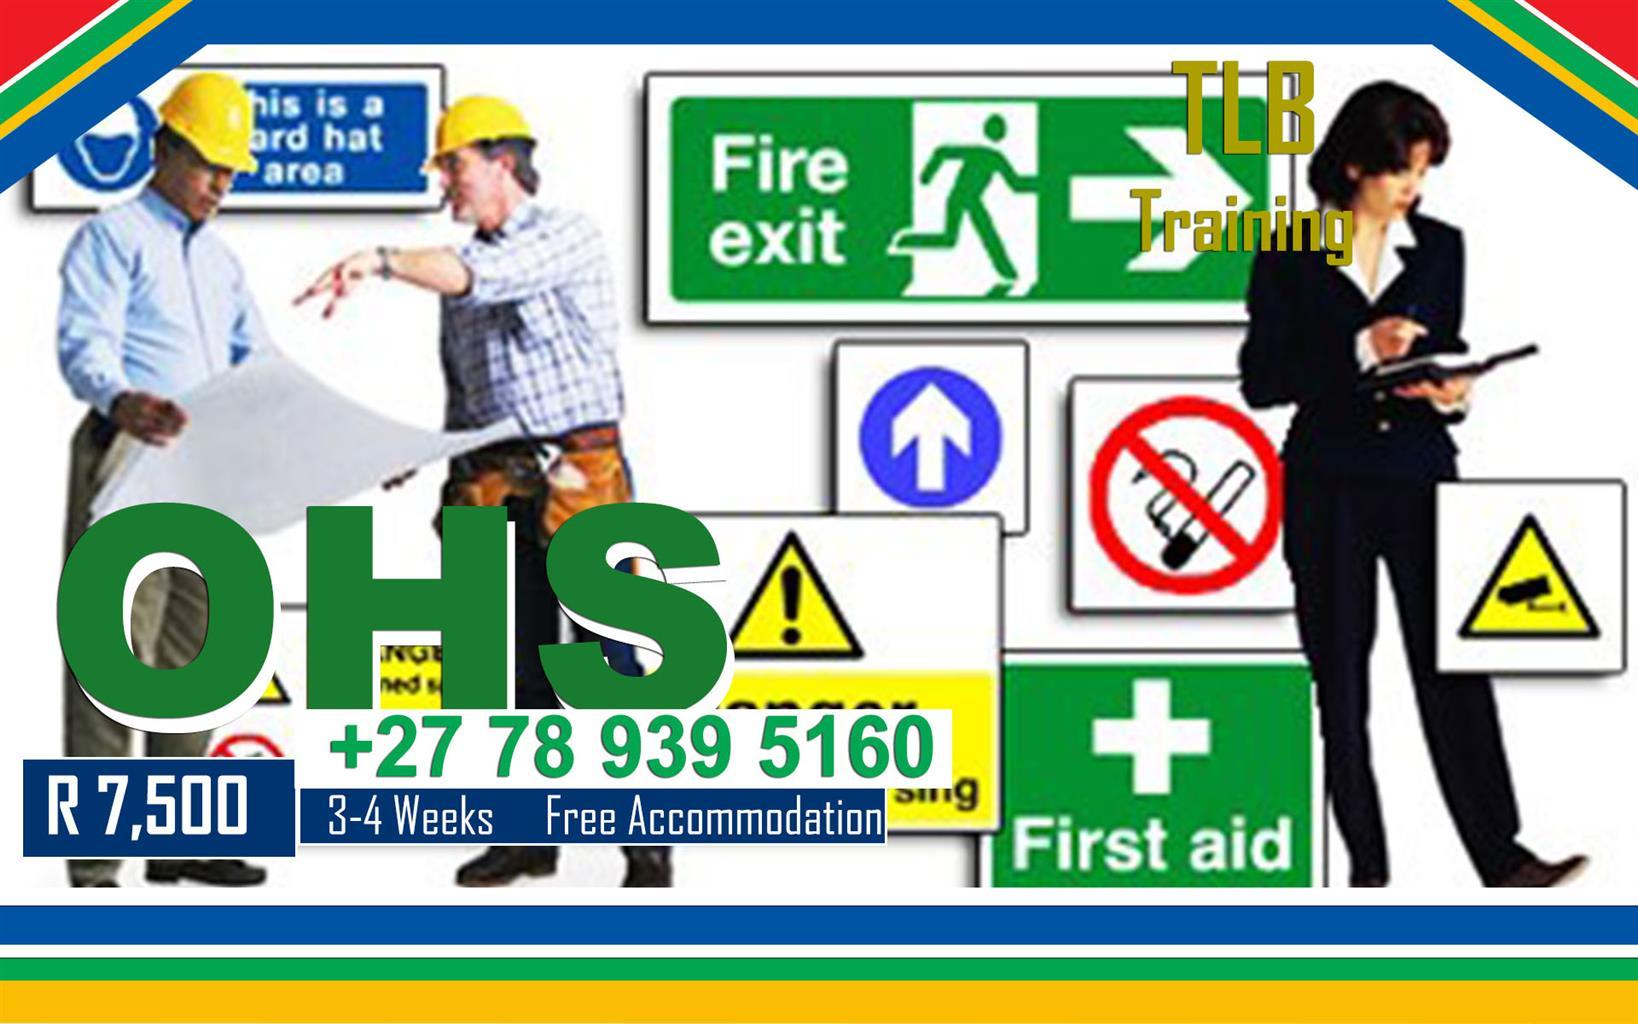 Scaffolding Training in Witbank 0712613657